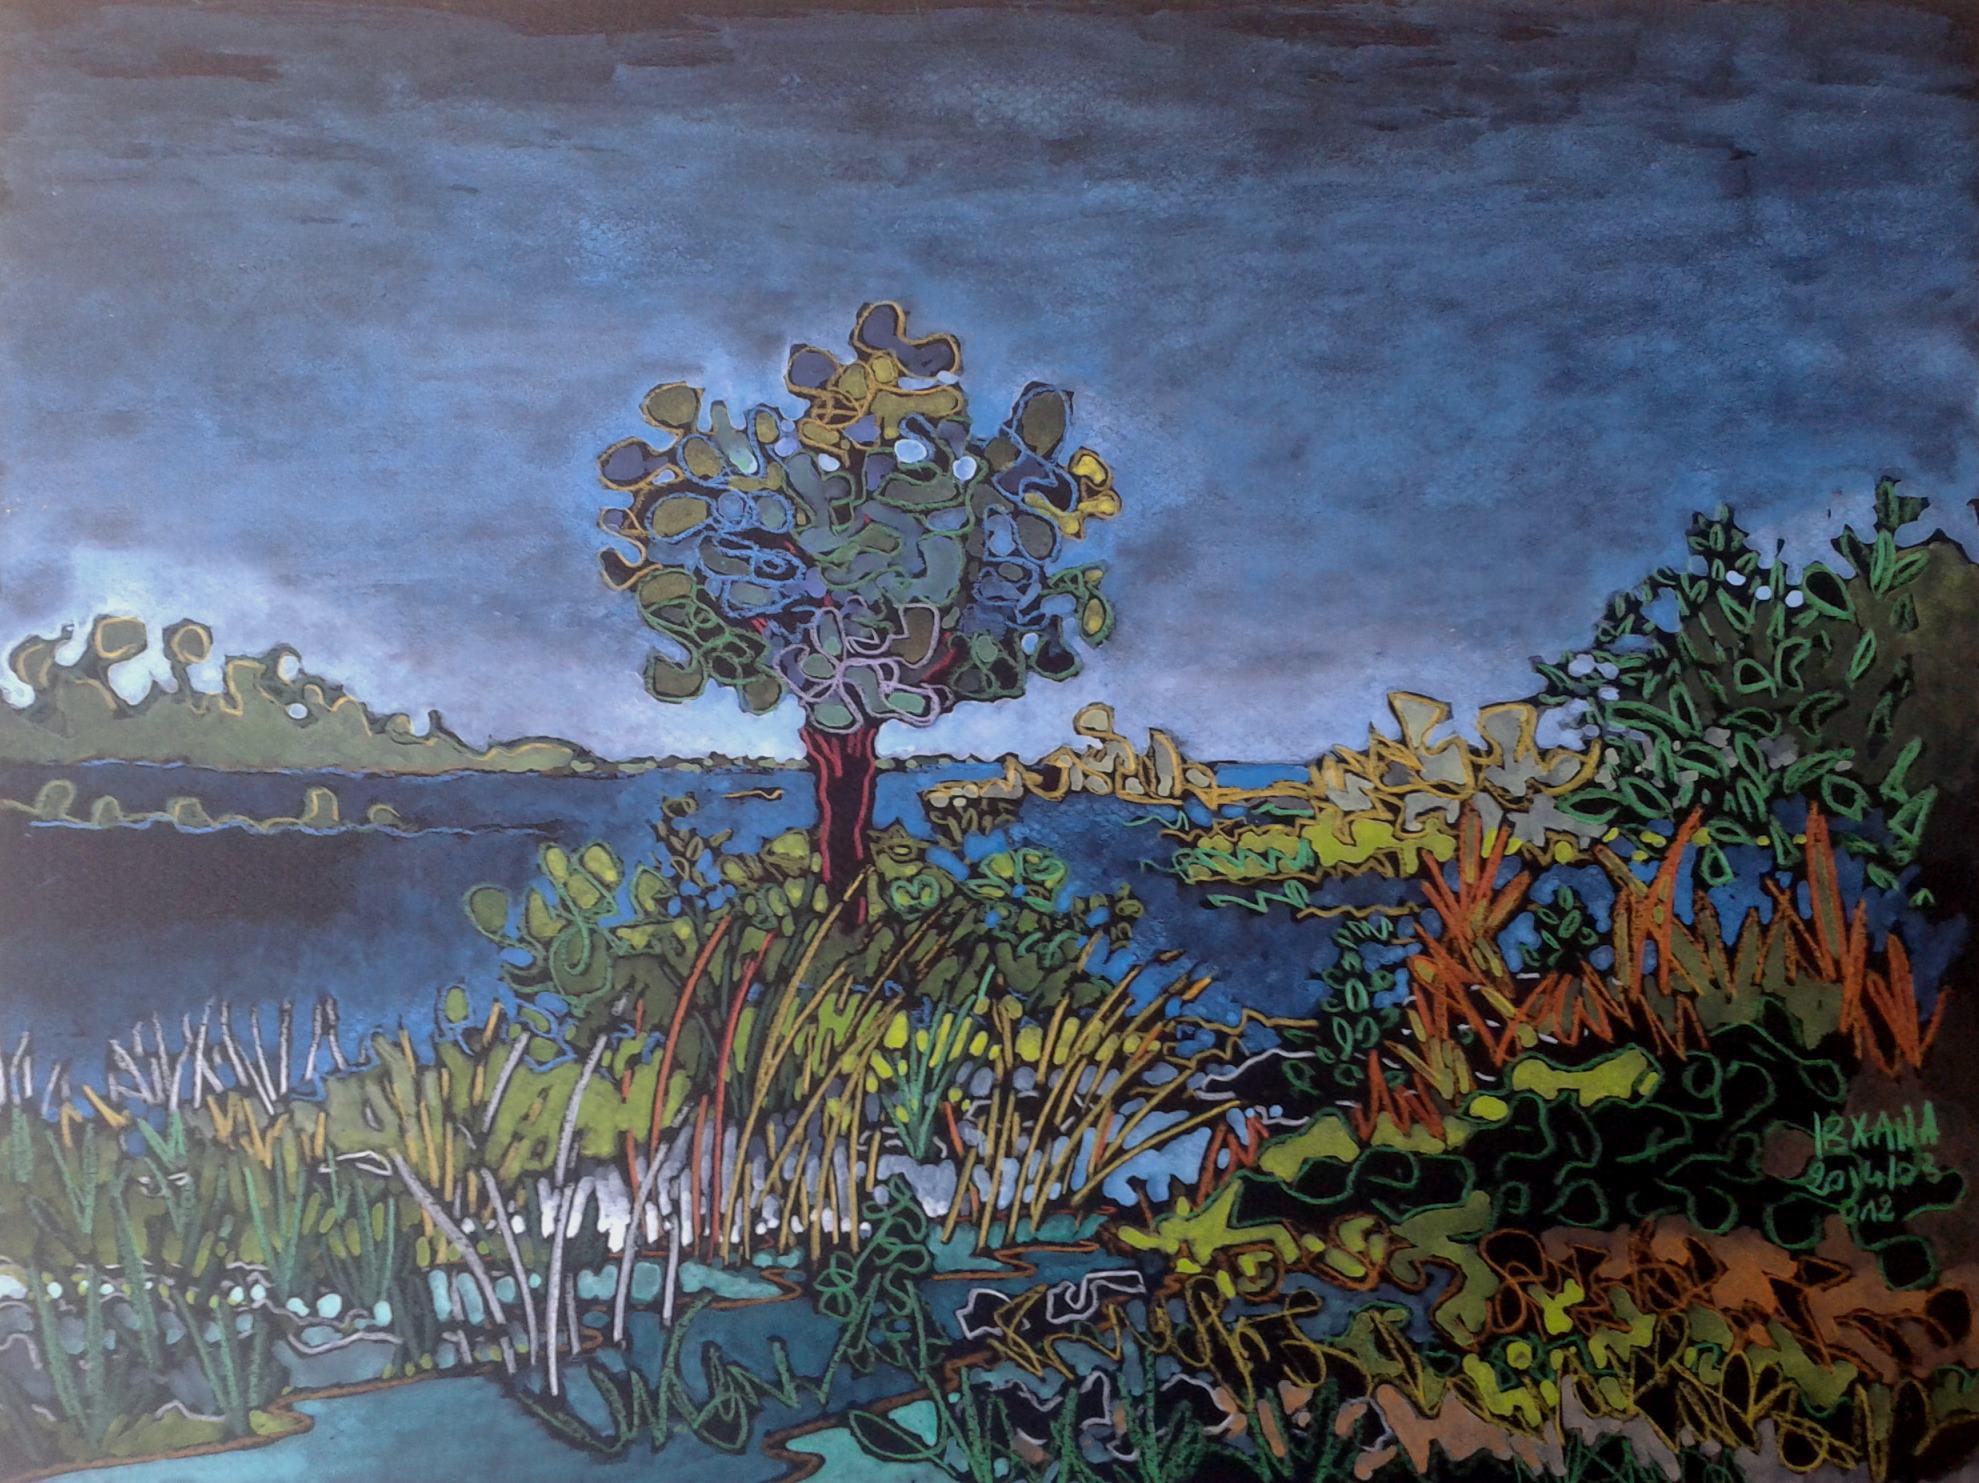 Le jardin de tonia rochefort en terre baie du soleil for Le jardin 75019